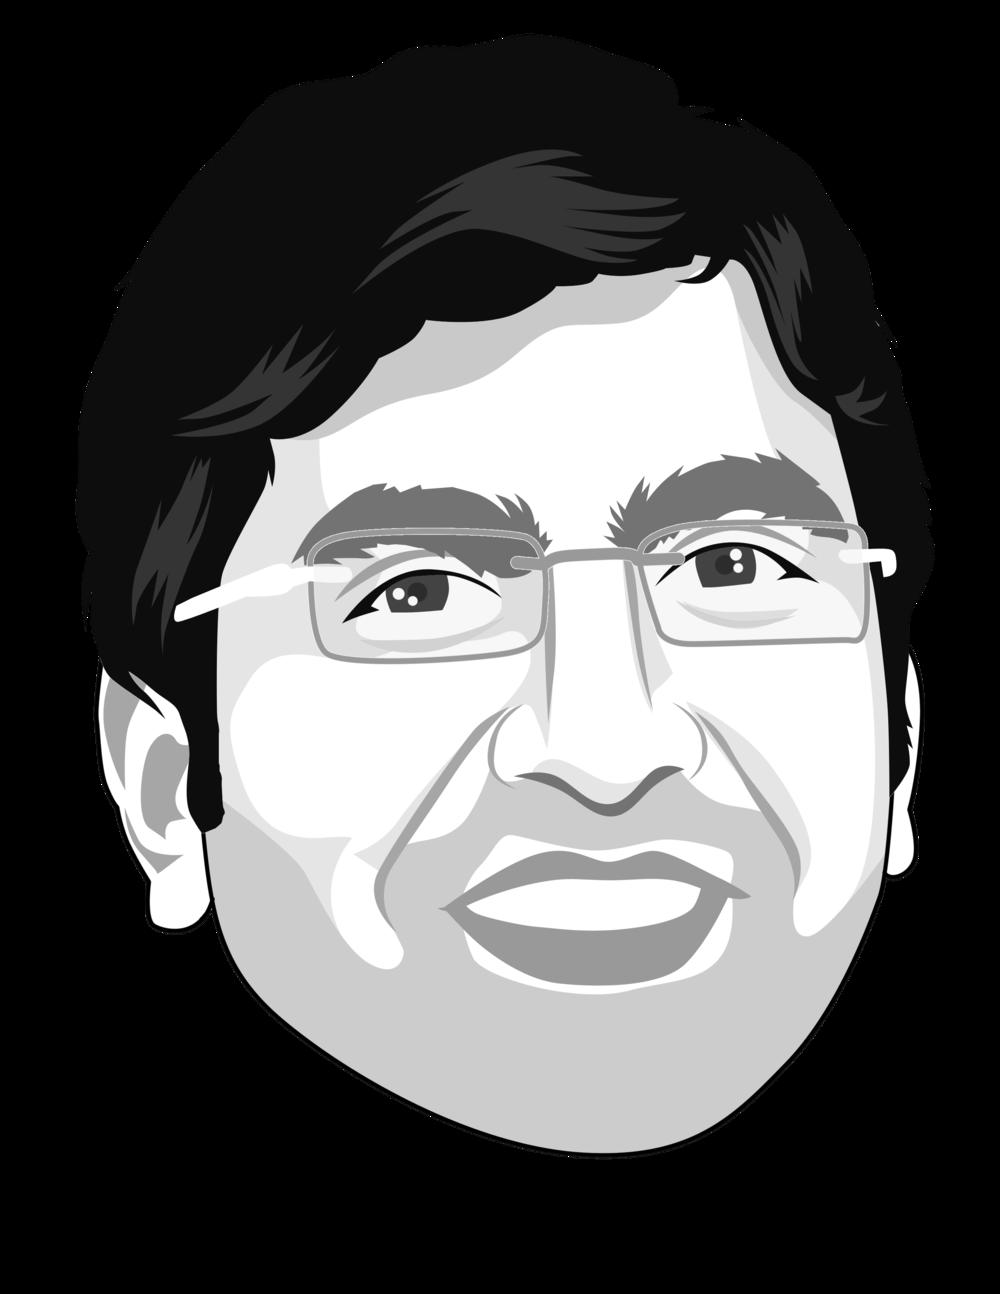 Anshul Jhawar